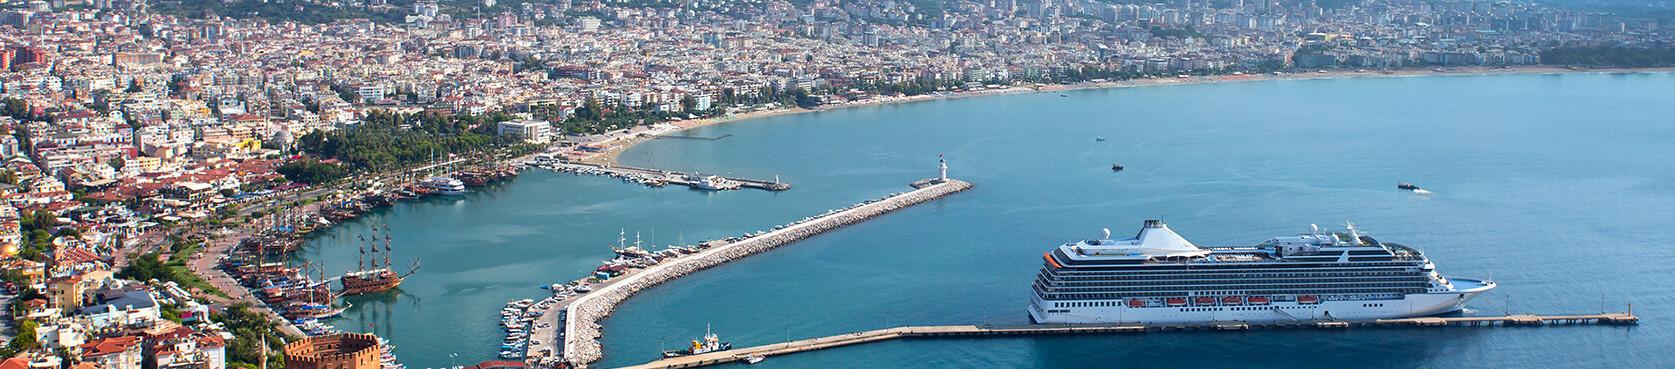 liman beach